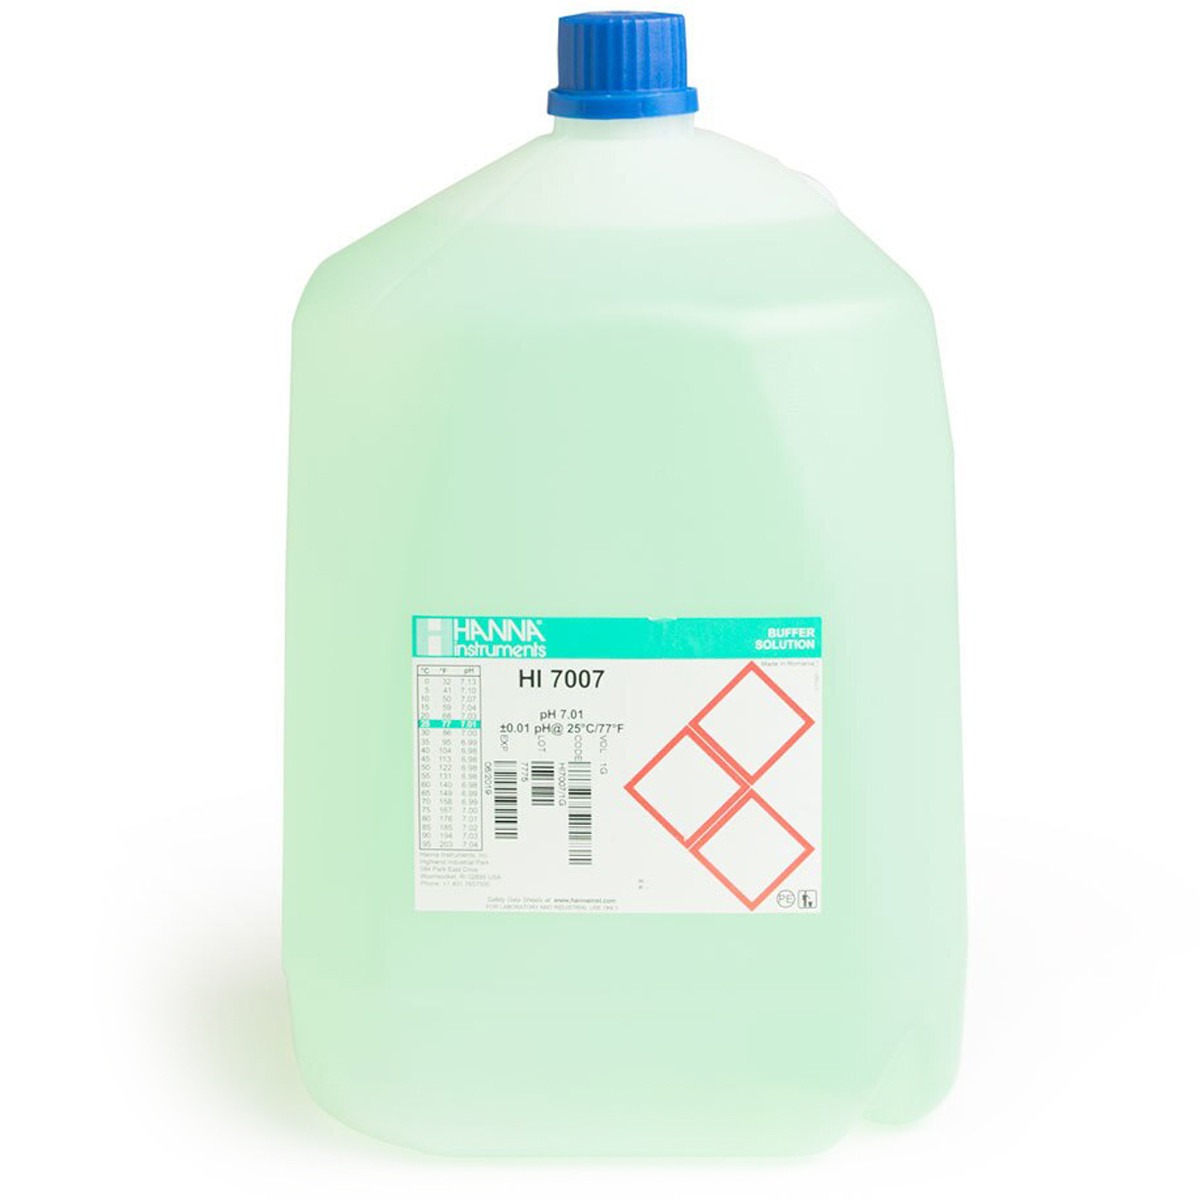 pH 7.01 Calibration Solution (1 G ( 3.78 L))